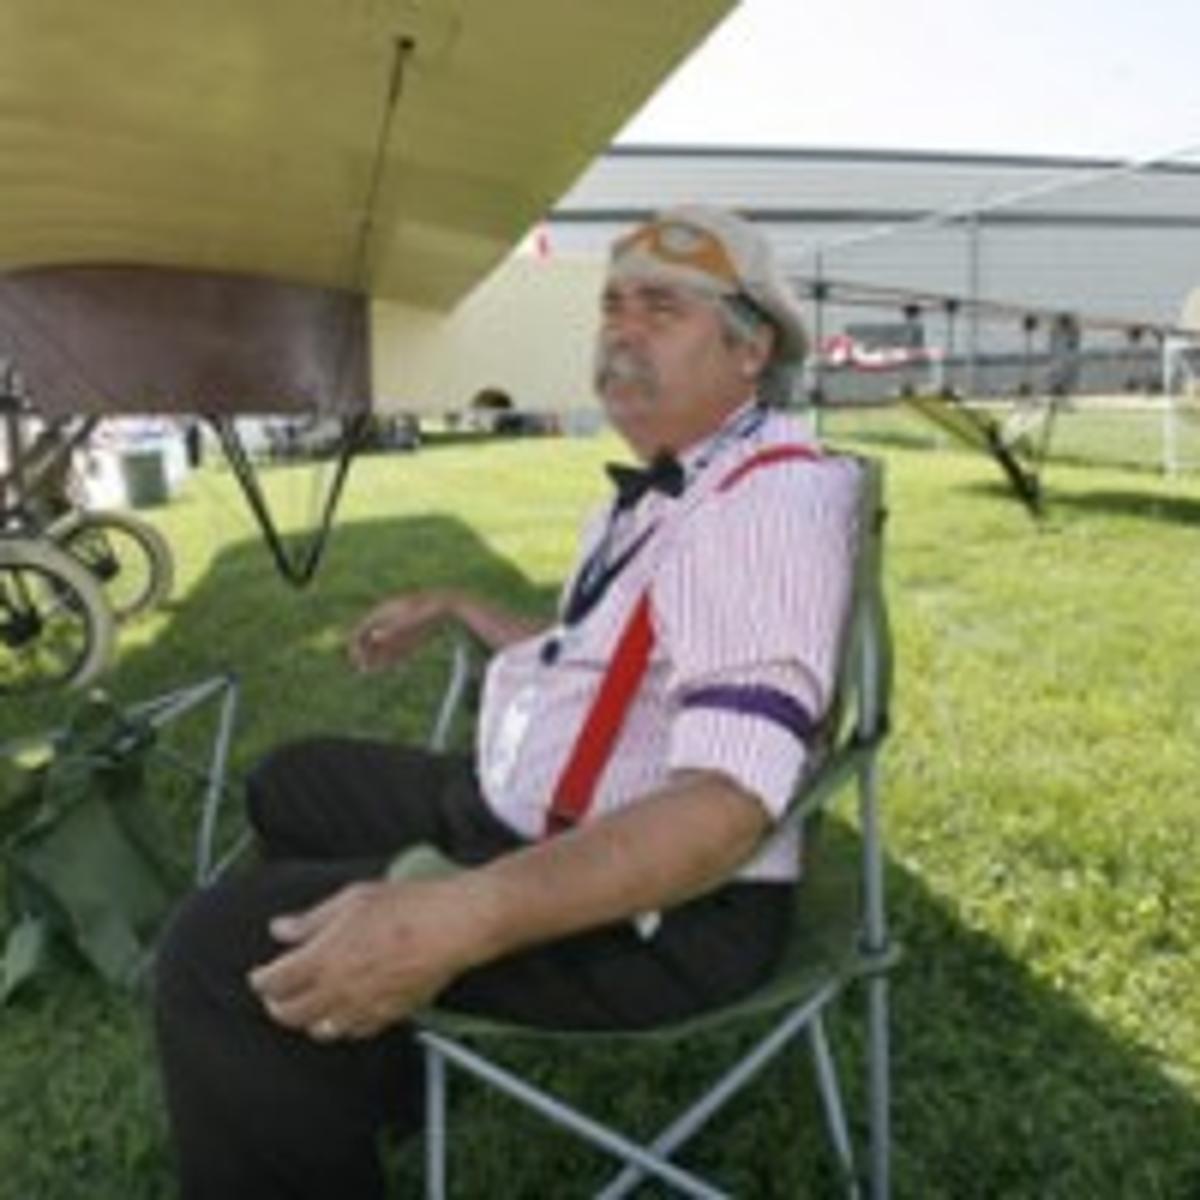 Barnstormers bring high-flying tour to North Iowa | Mason City